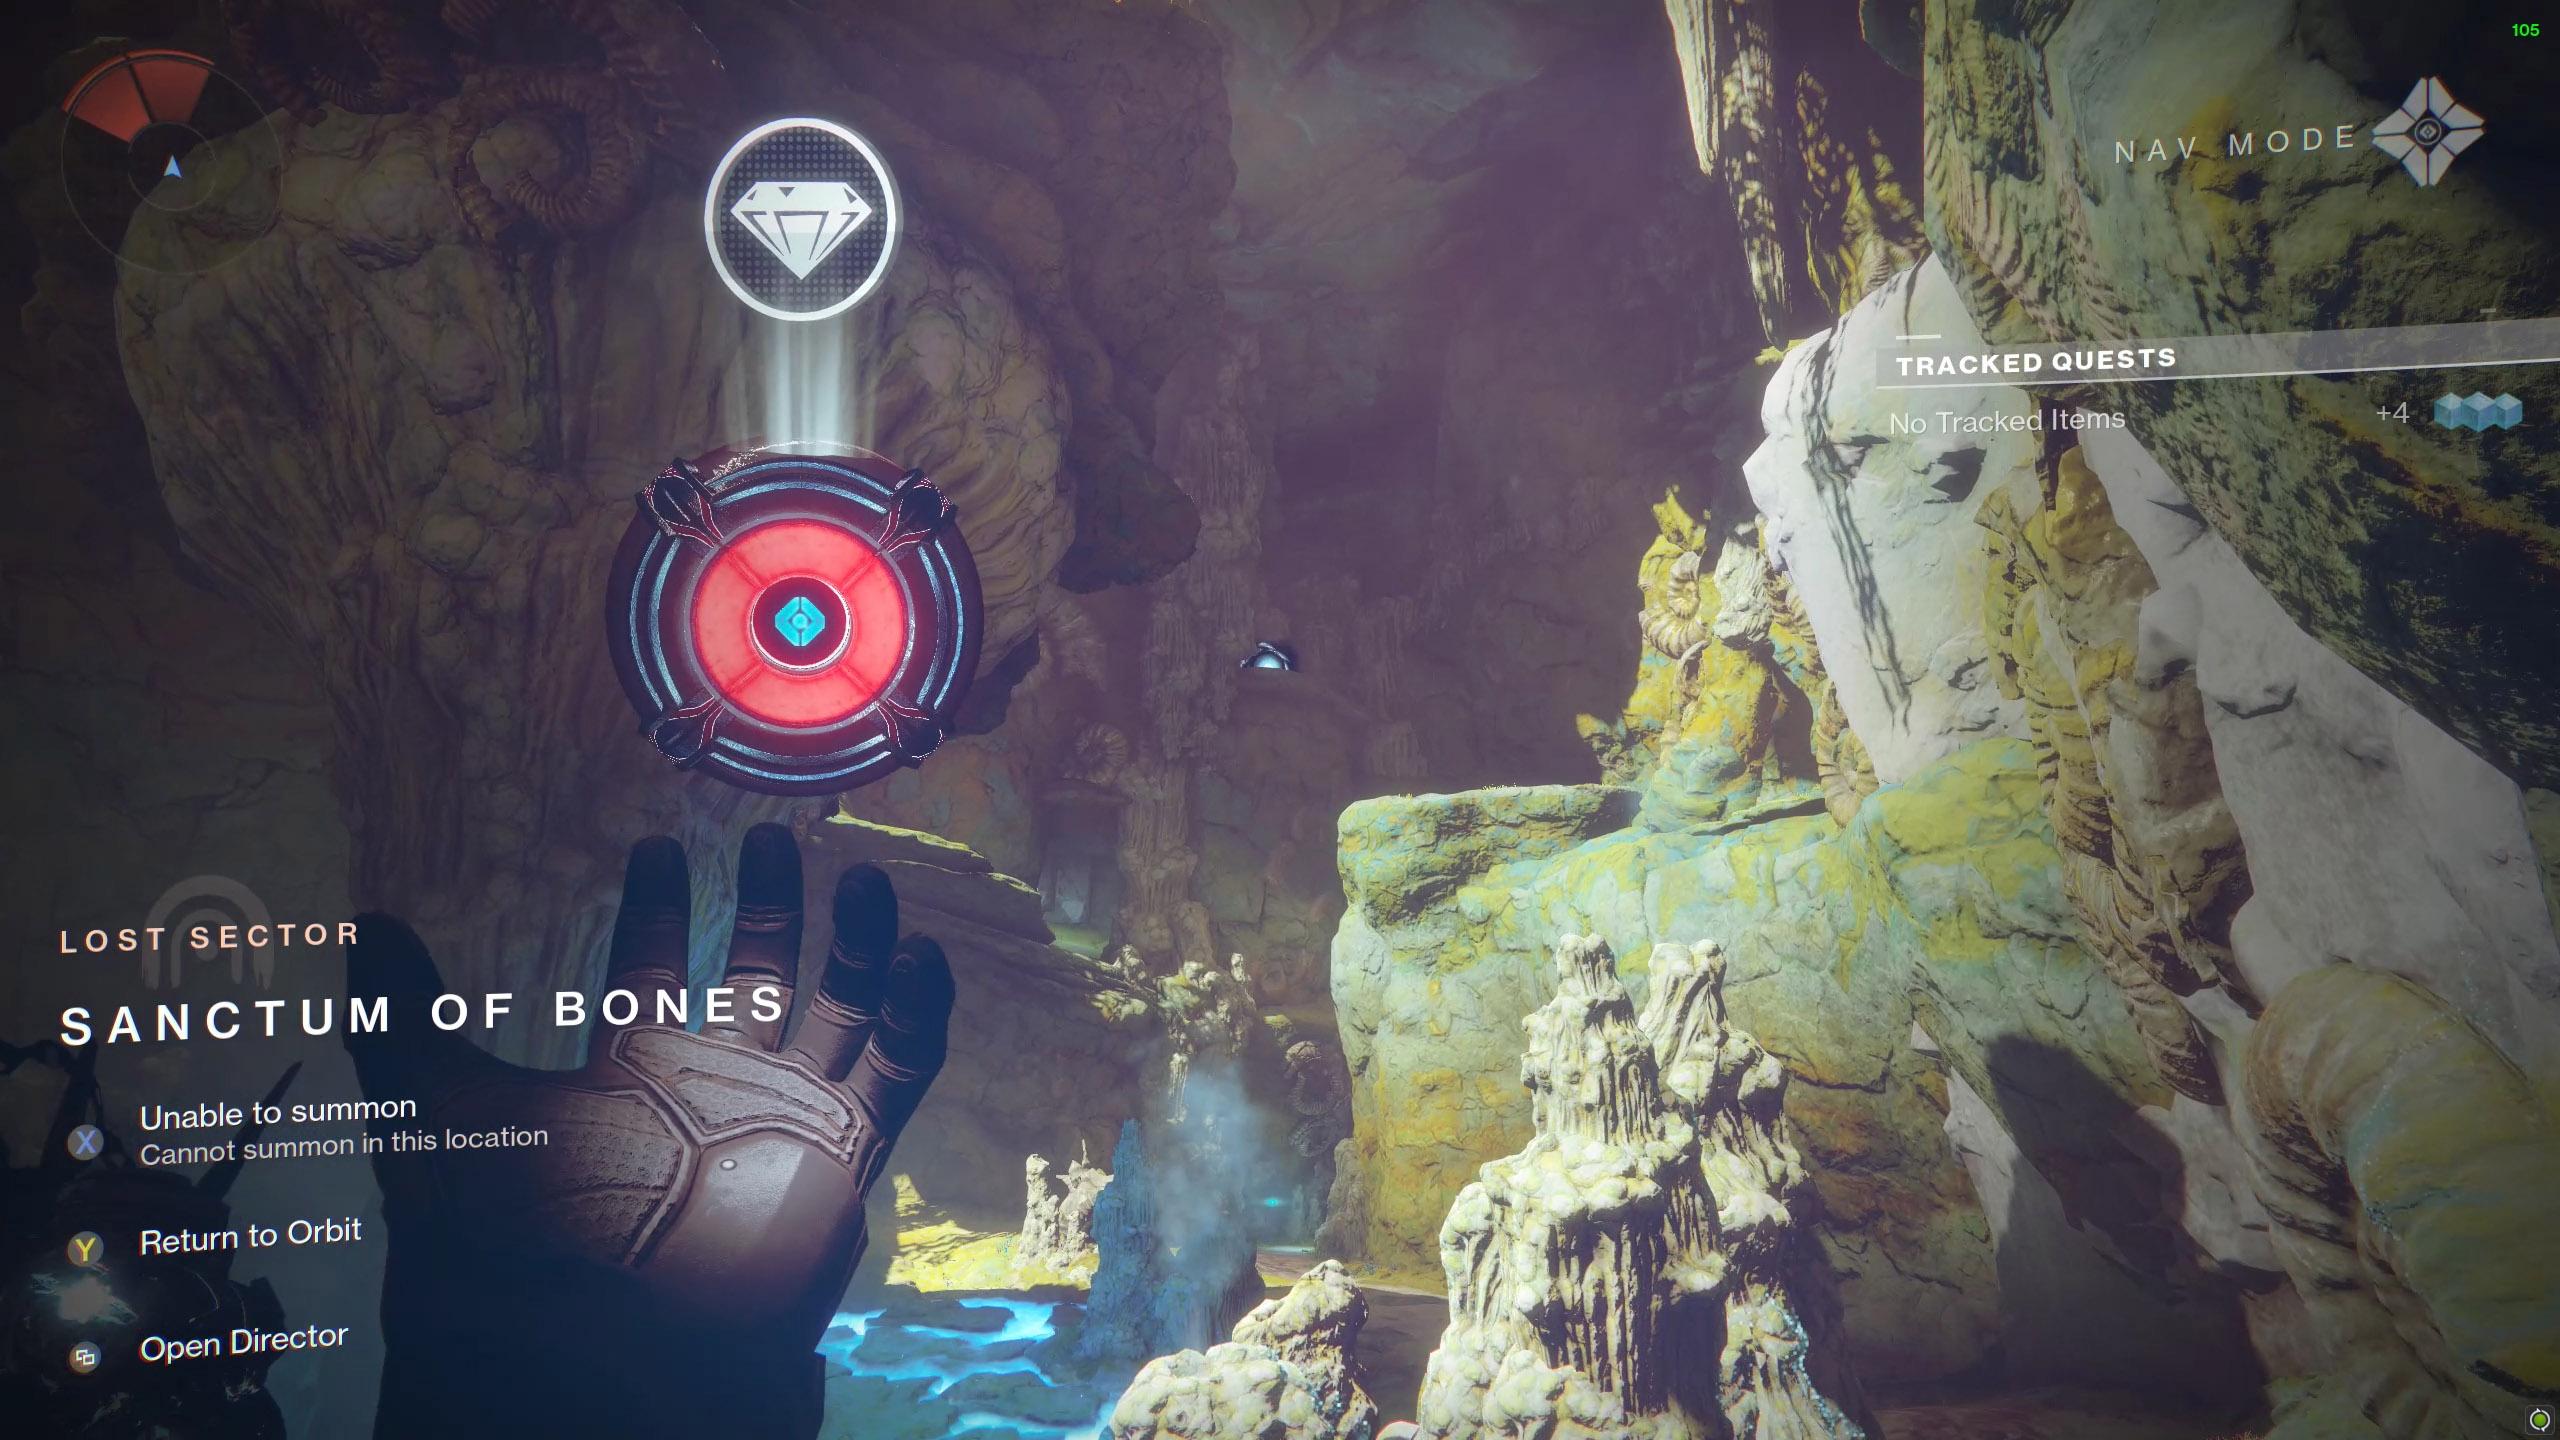 Destiny 2 Savanthuns Eyes Io Sanctum of Bones